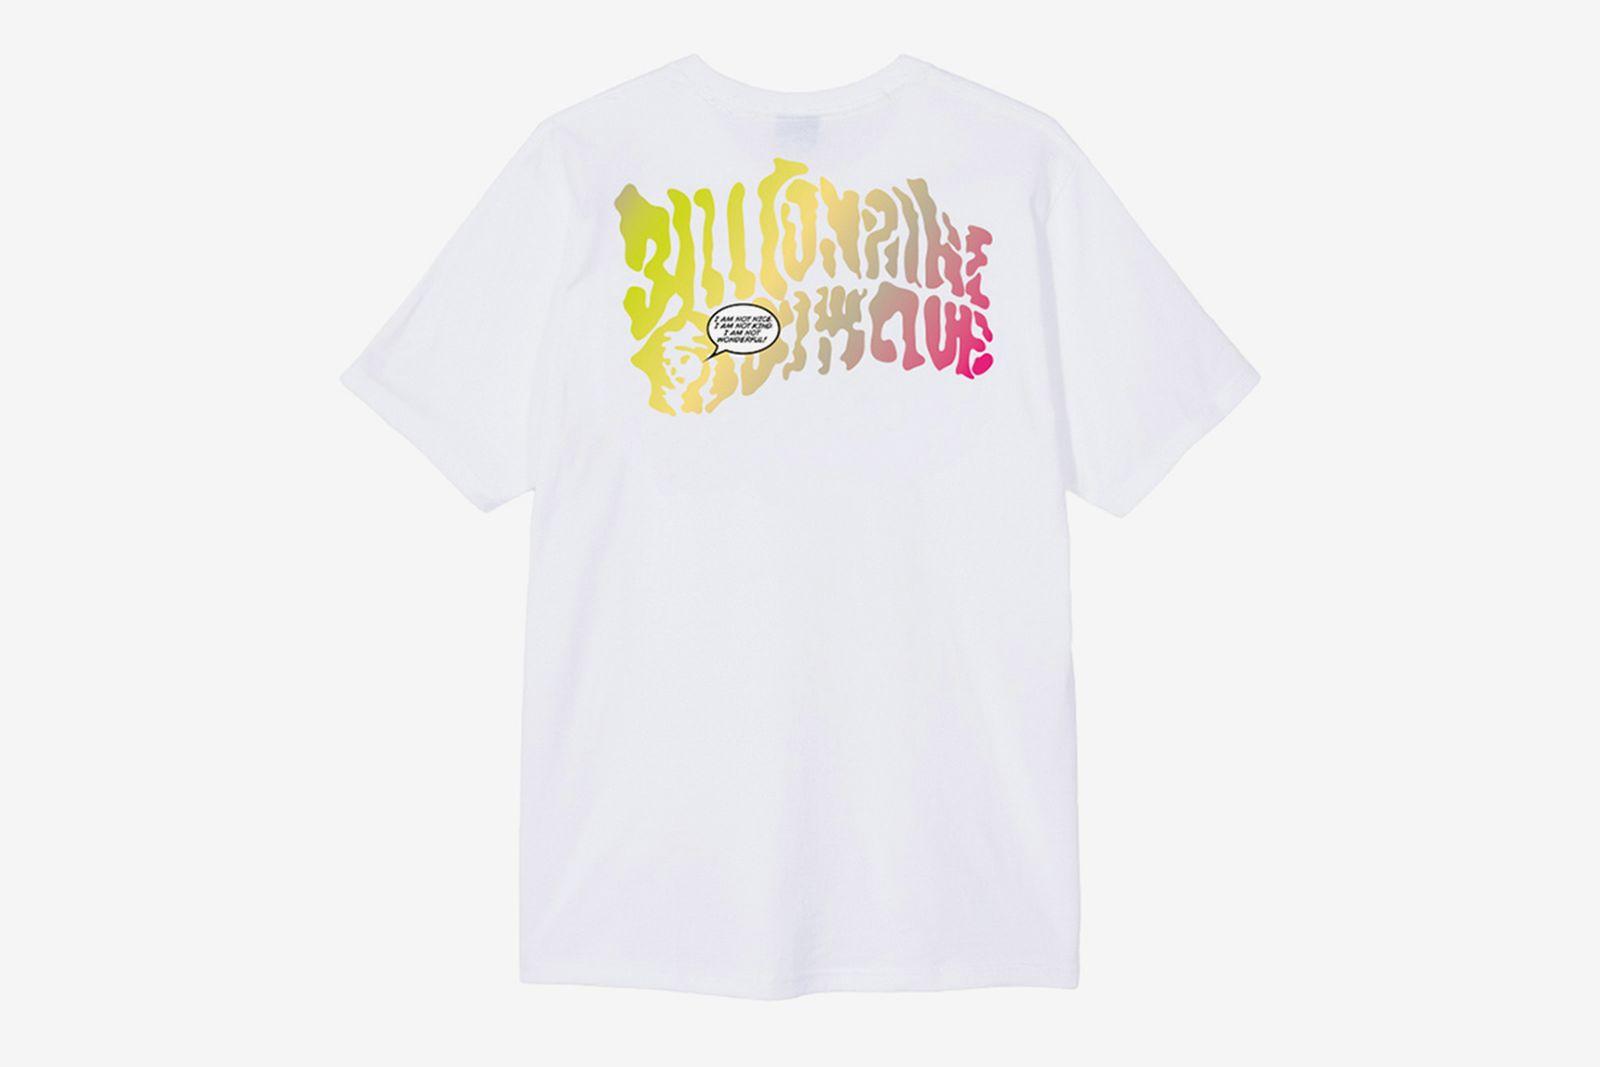 Billionaire Boys Club x Mattel's Spooky 'Master of the Universe' T-shirt white